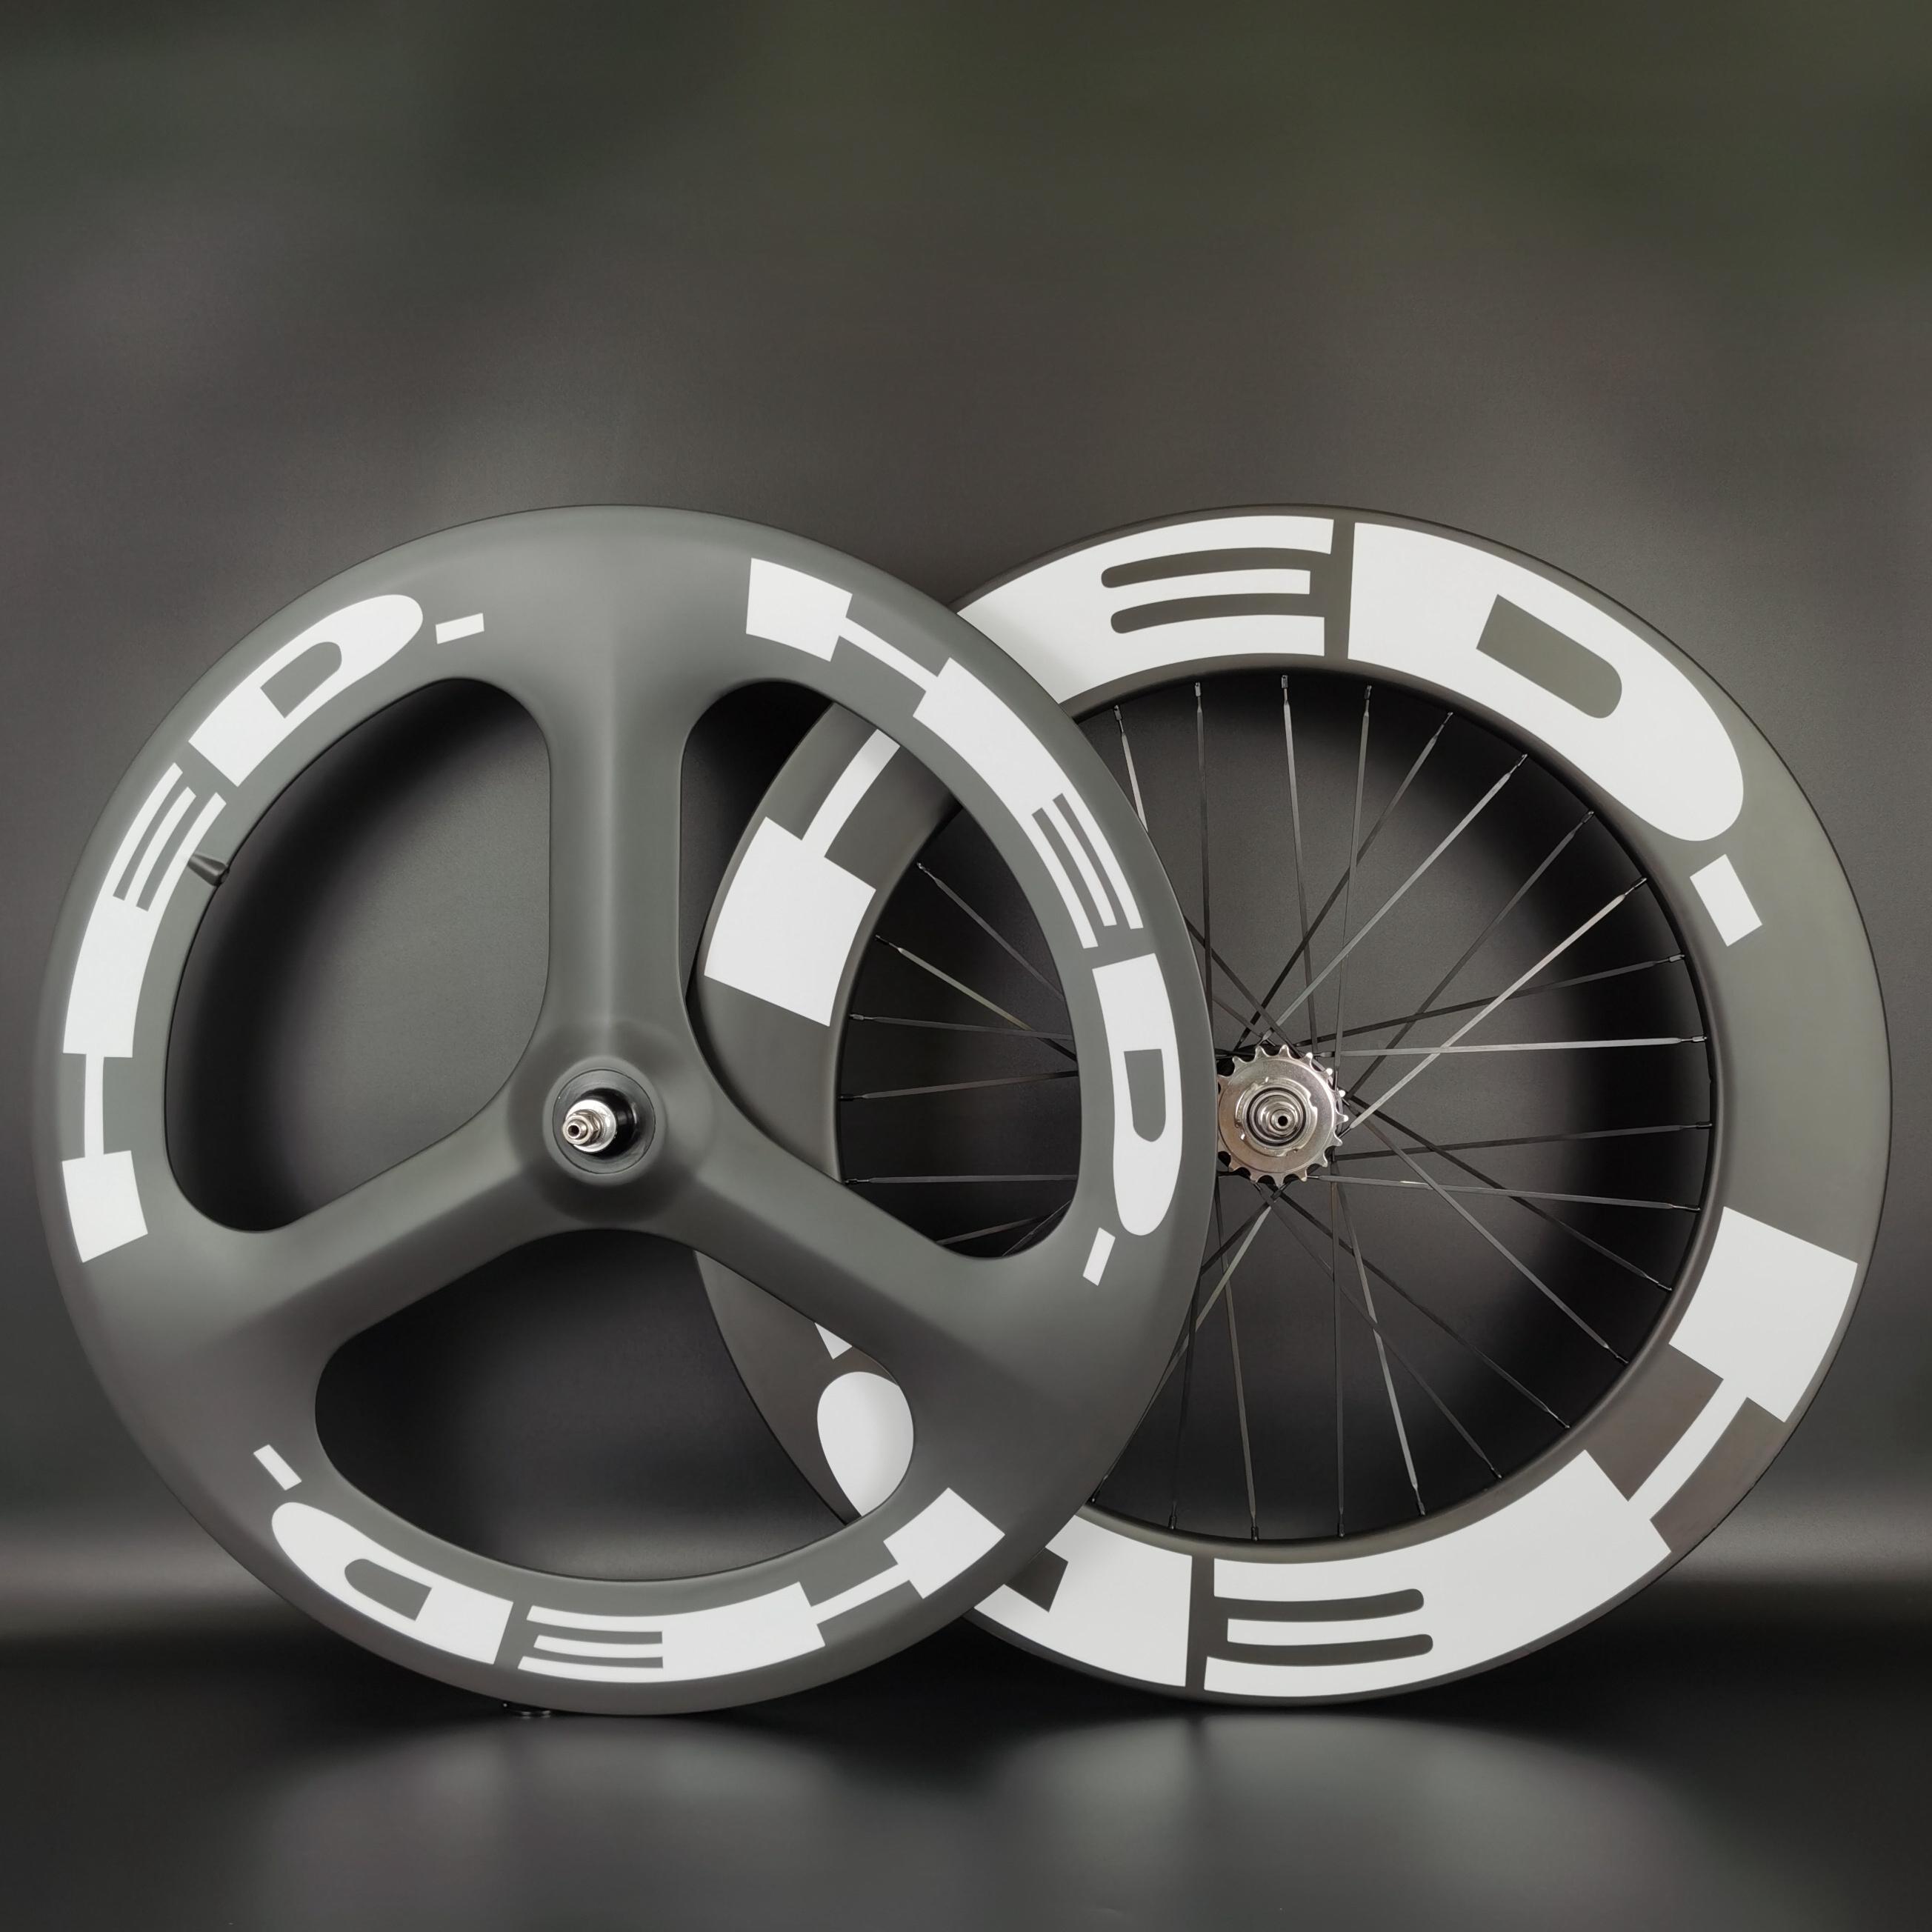 HED 700C 탄소 바퀴 전면 트라이 스포크 리어 88mm 깊이 도로 / 트랙 자전거 클린 치 / 관형 3 스마크 고정 기어 휠셋이있는 UD 무광택 마감